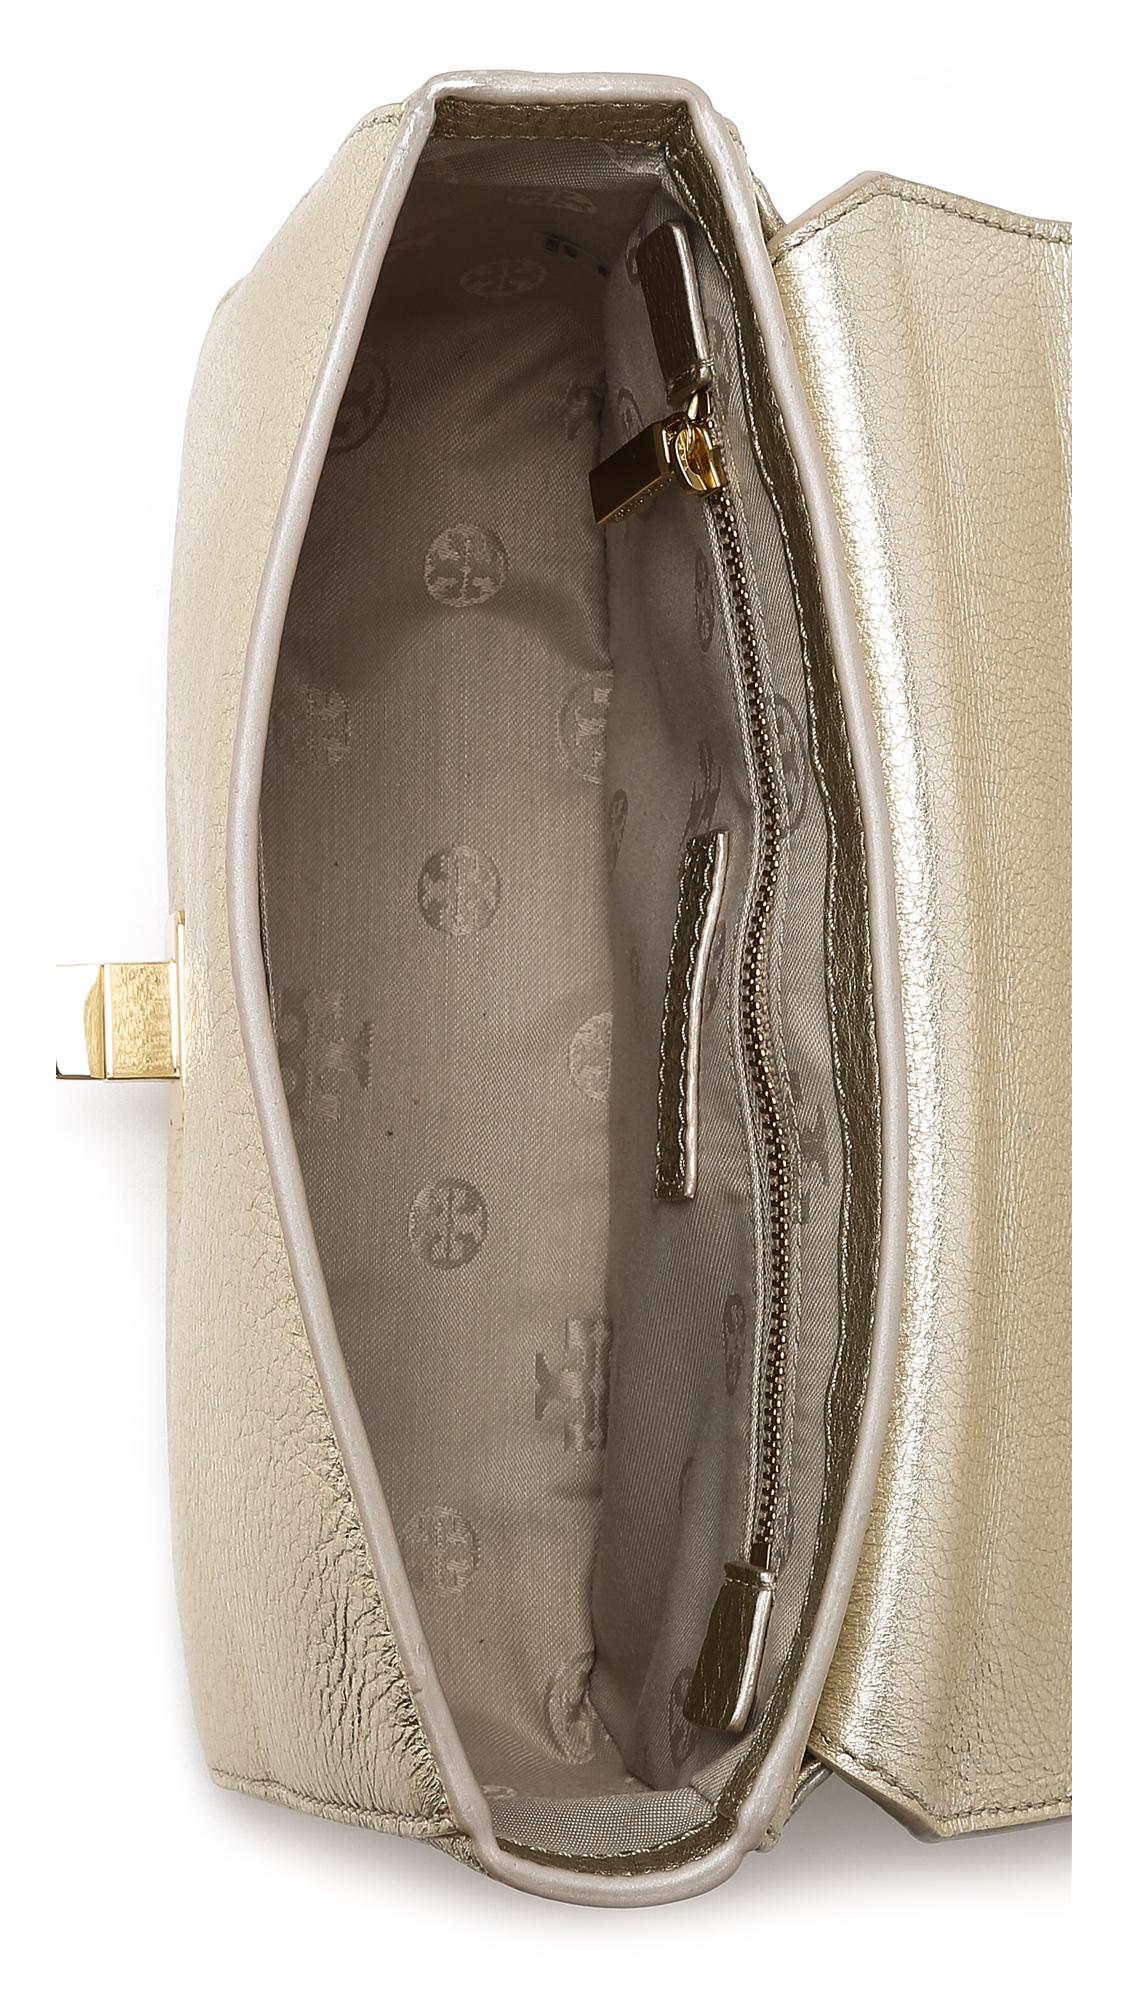 29f2691ce4d3 Tory Burch Mercer Adjustable Shoulder Bag in Metallic - Lyst